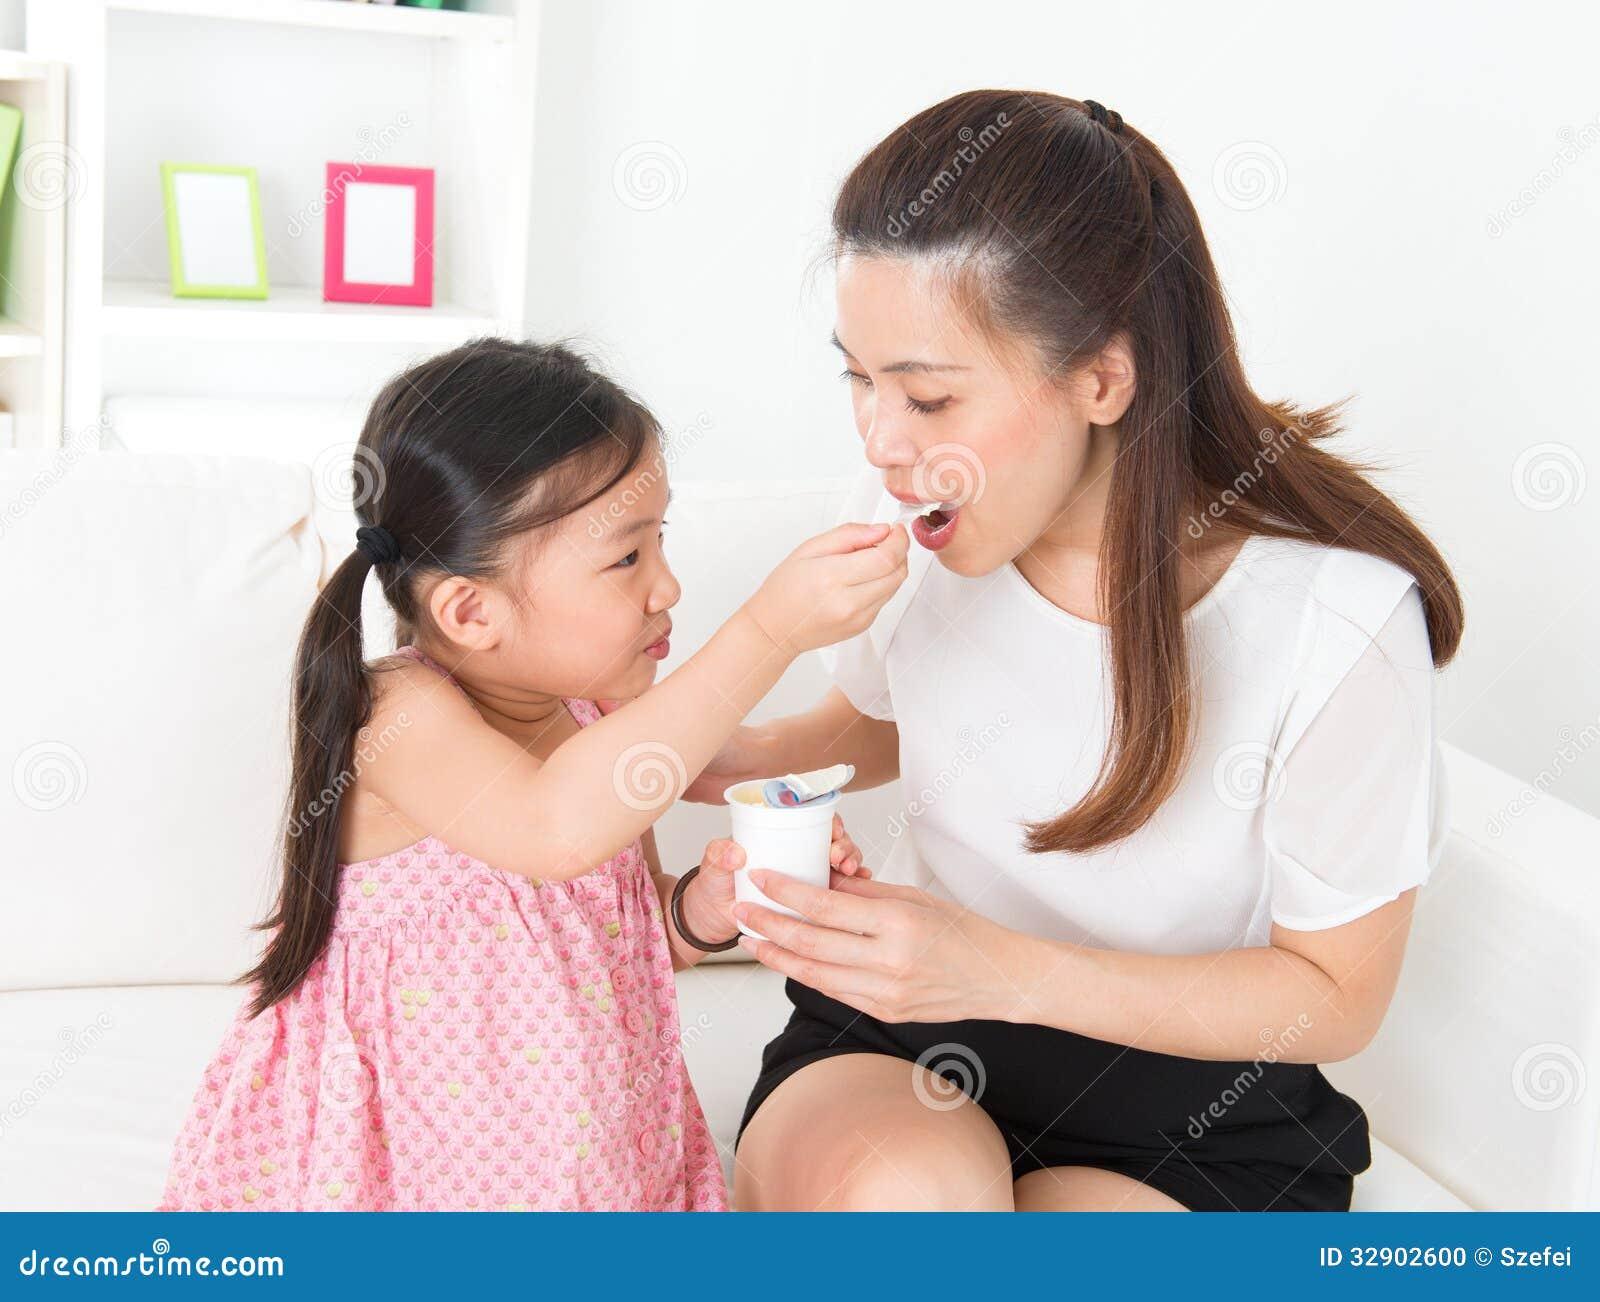 Clipart Of Yogurt